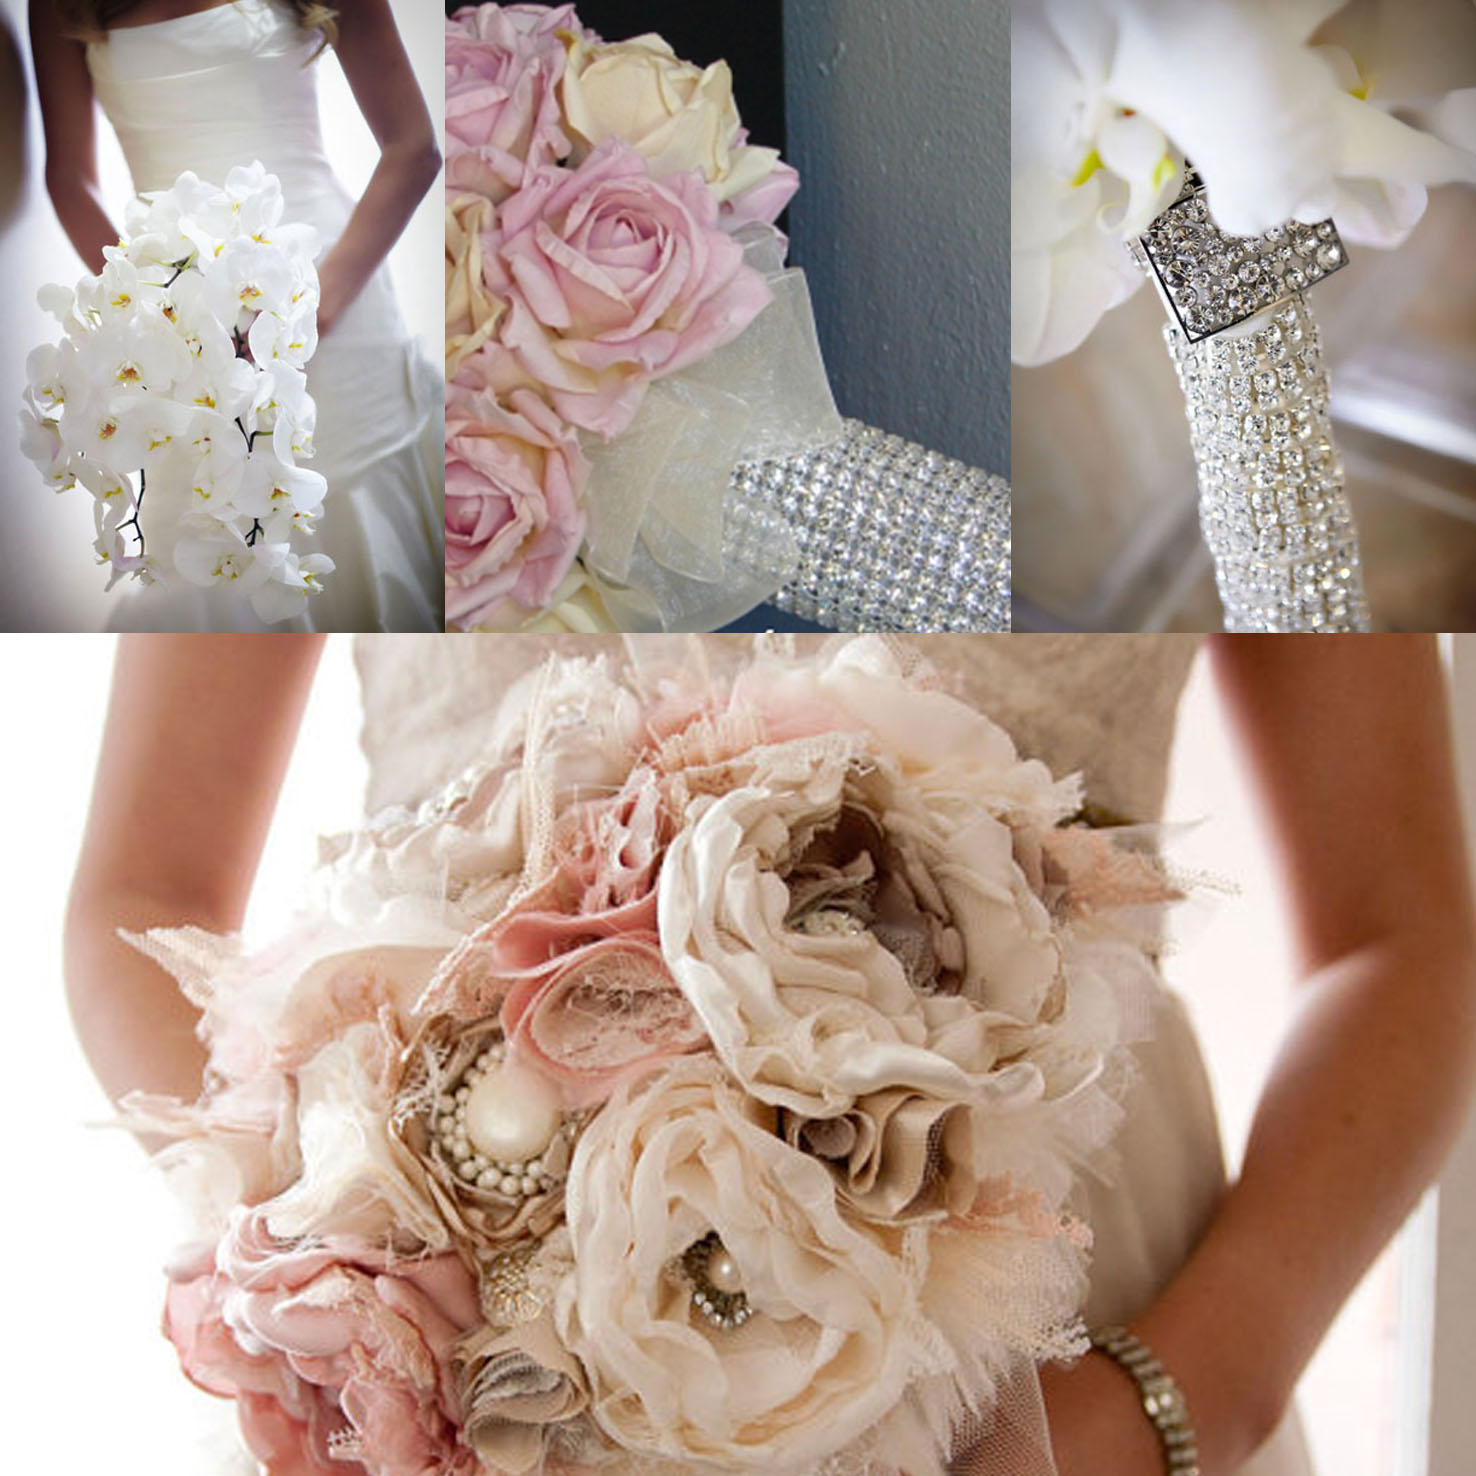 diamonds and pearls theme - photo #8